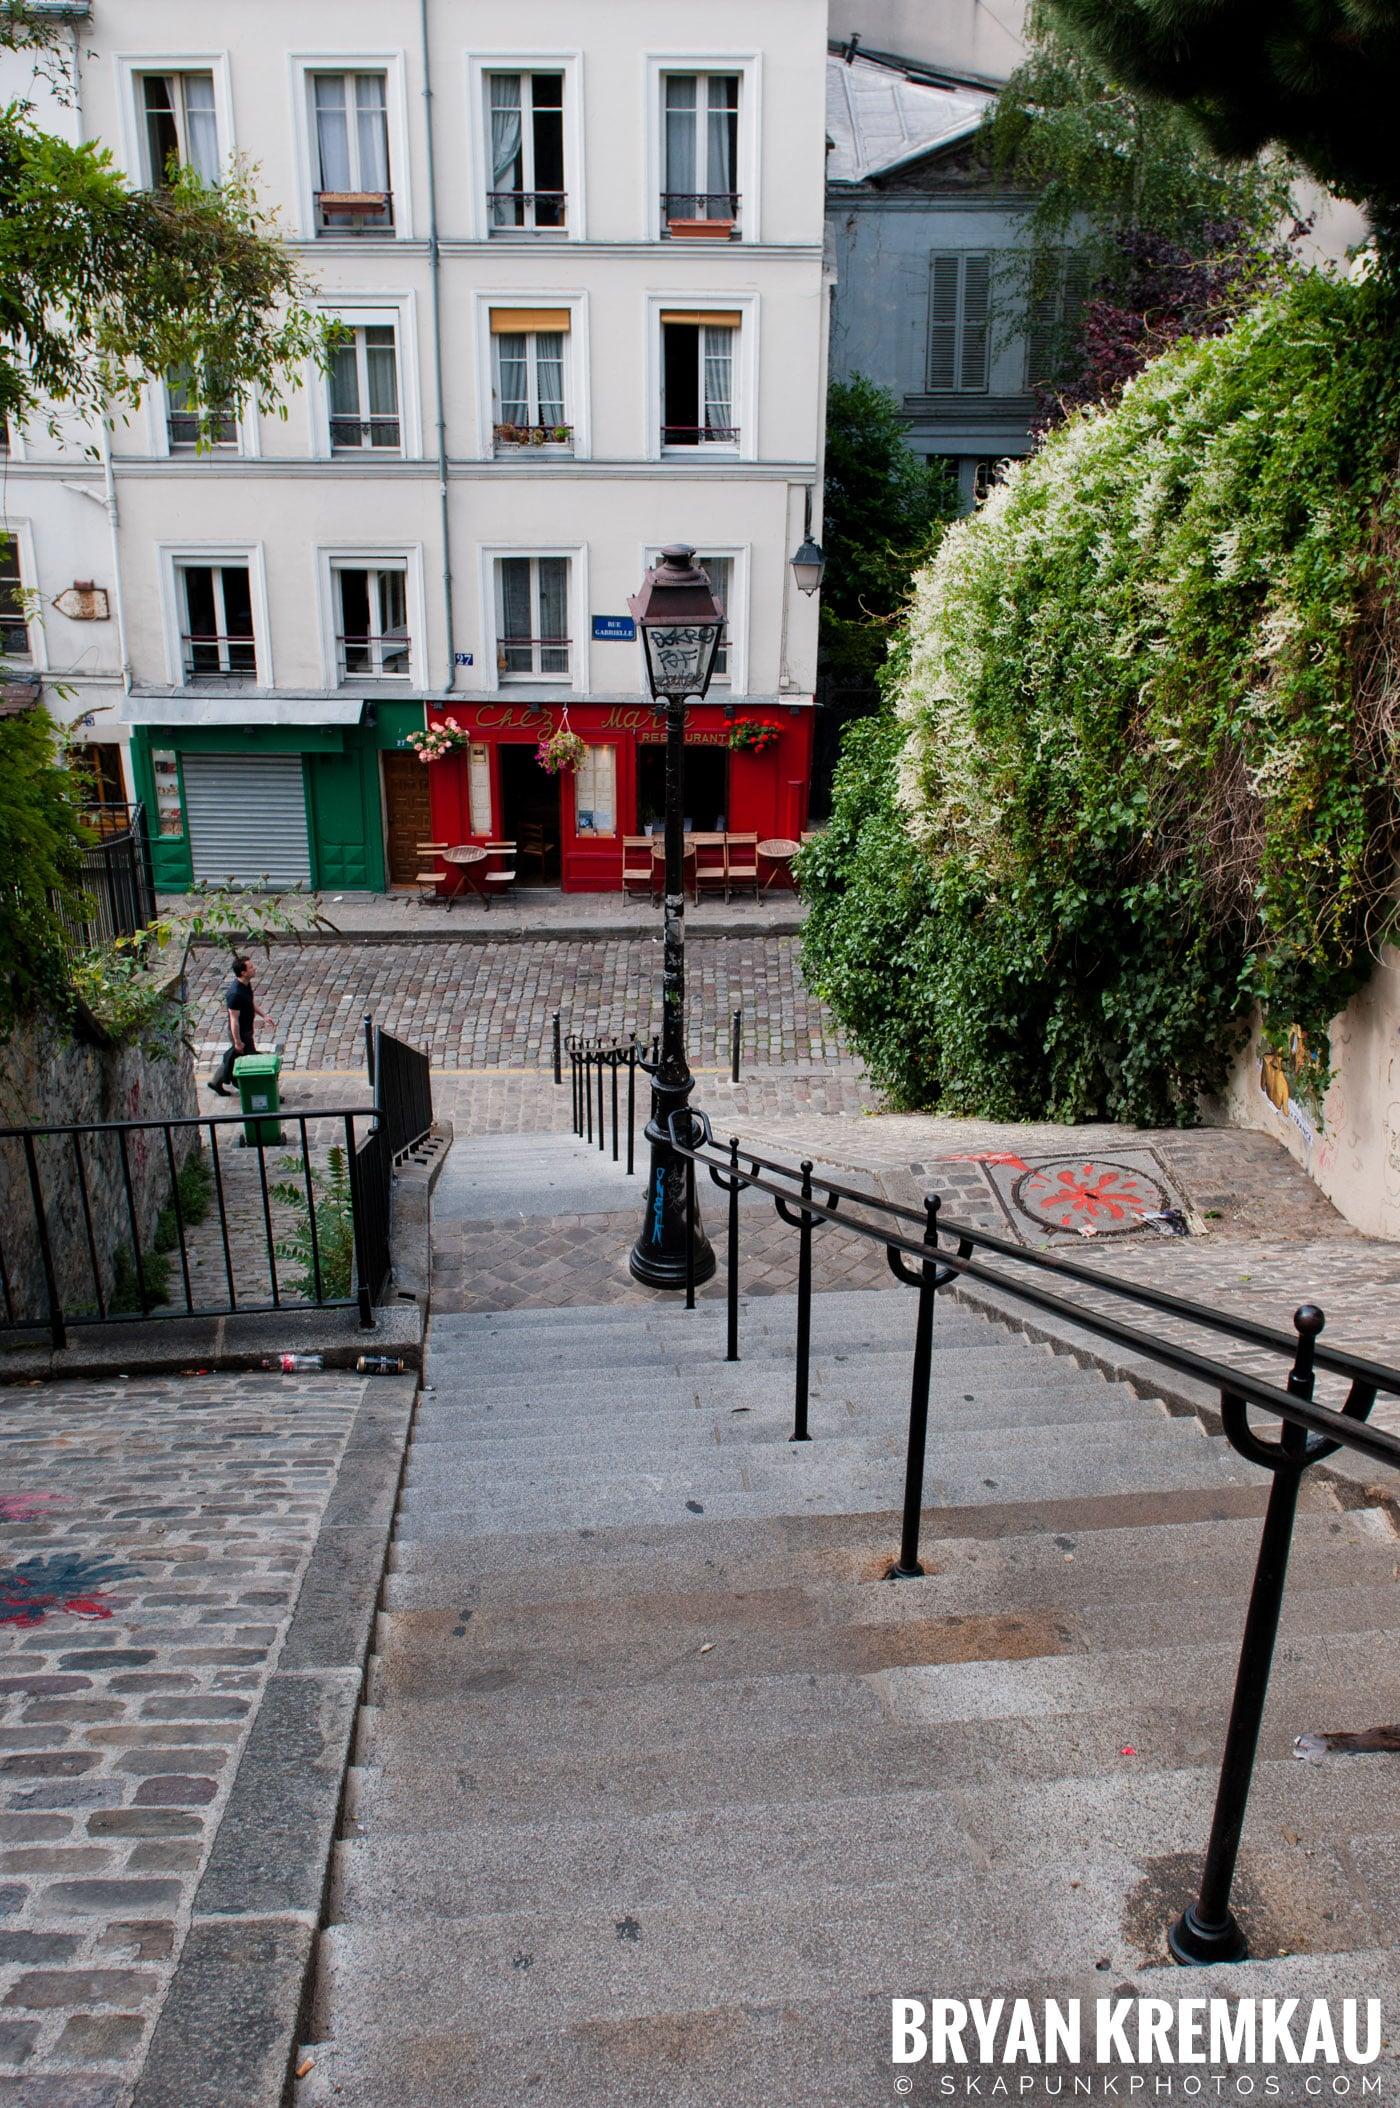 Paris, France Honeymoon - Day 6 - 7.23.11 (41)